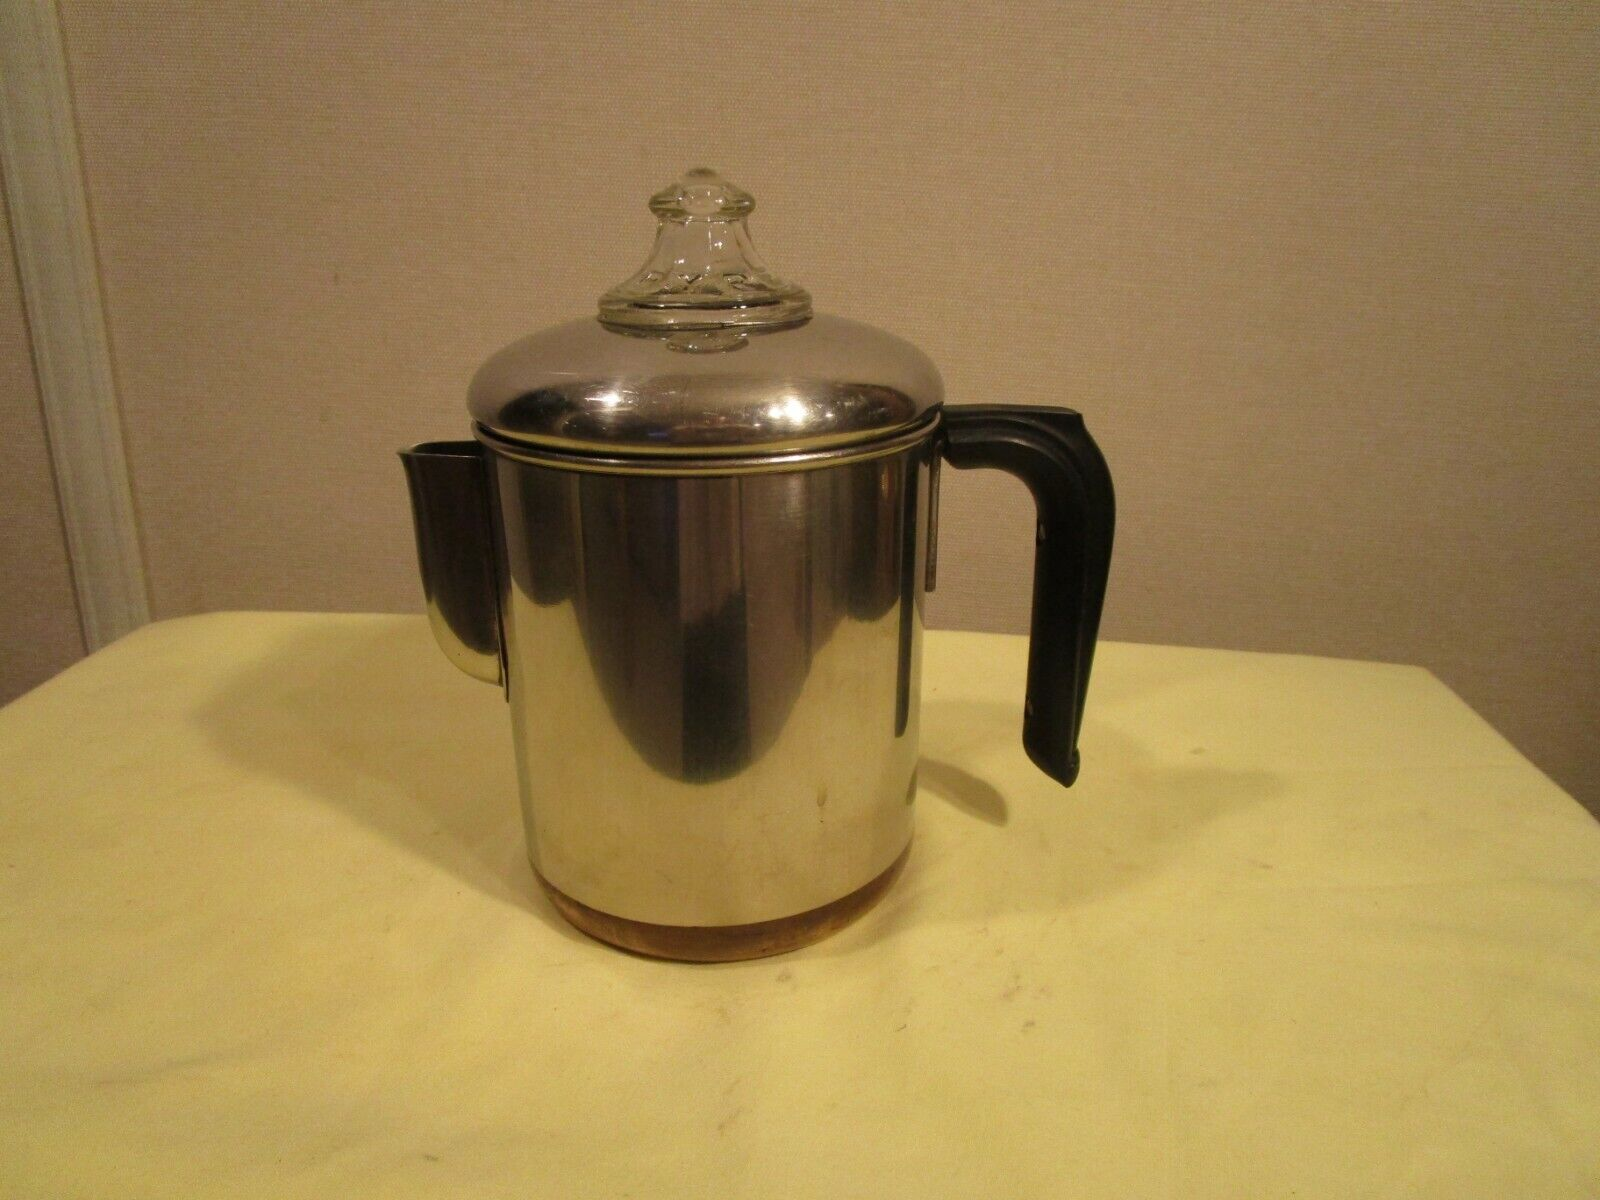 VINTAGE REVERE WARE 1801 COFFEE POT STOVE TOP COPPER CLAD PE